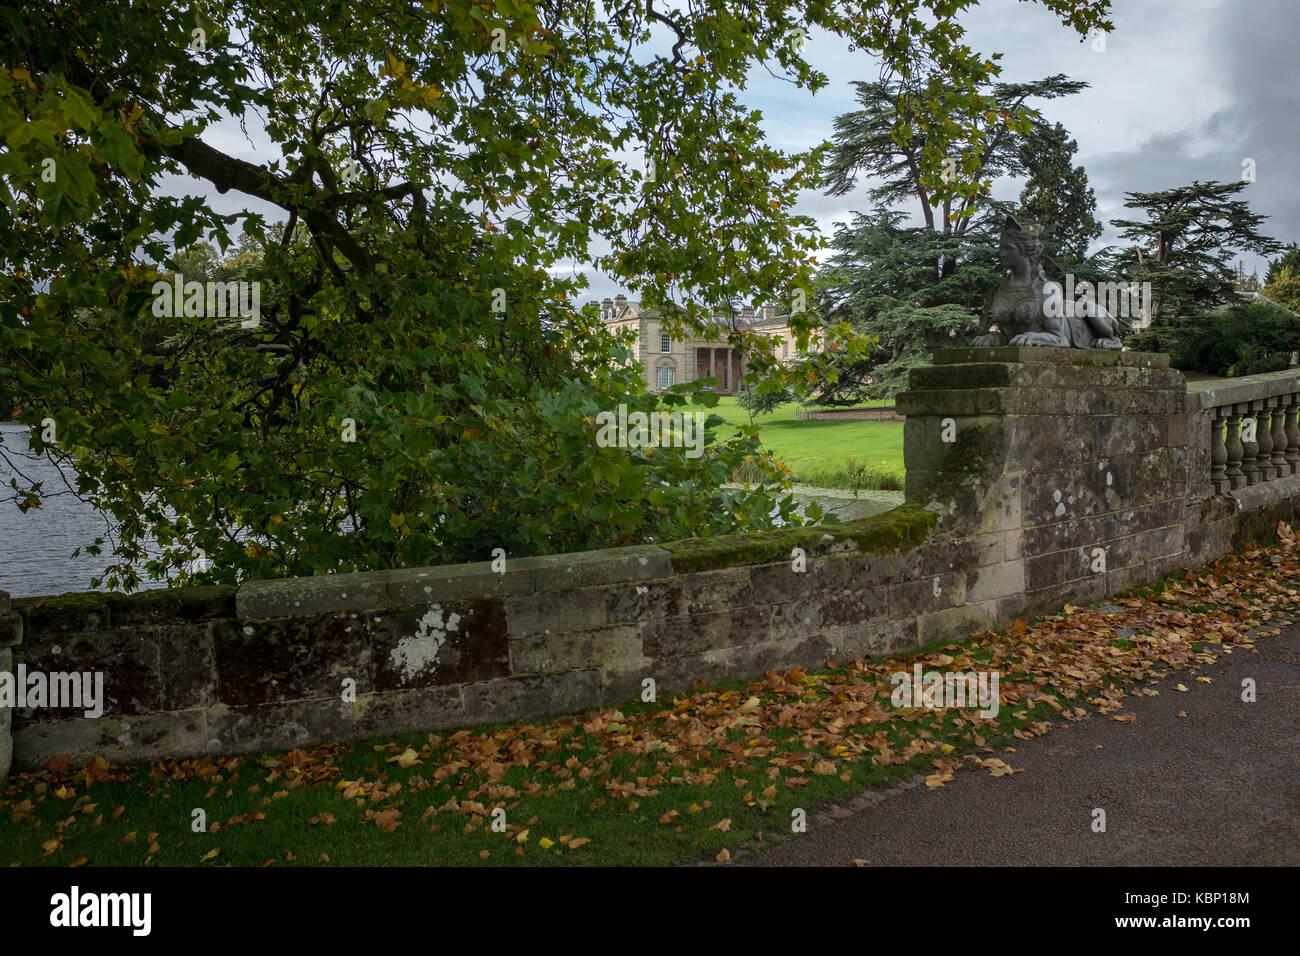 Compton Verney art gallery, Warwickshire UK - Stock Image